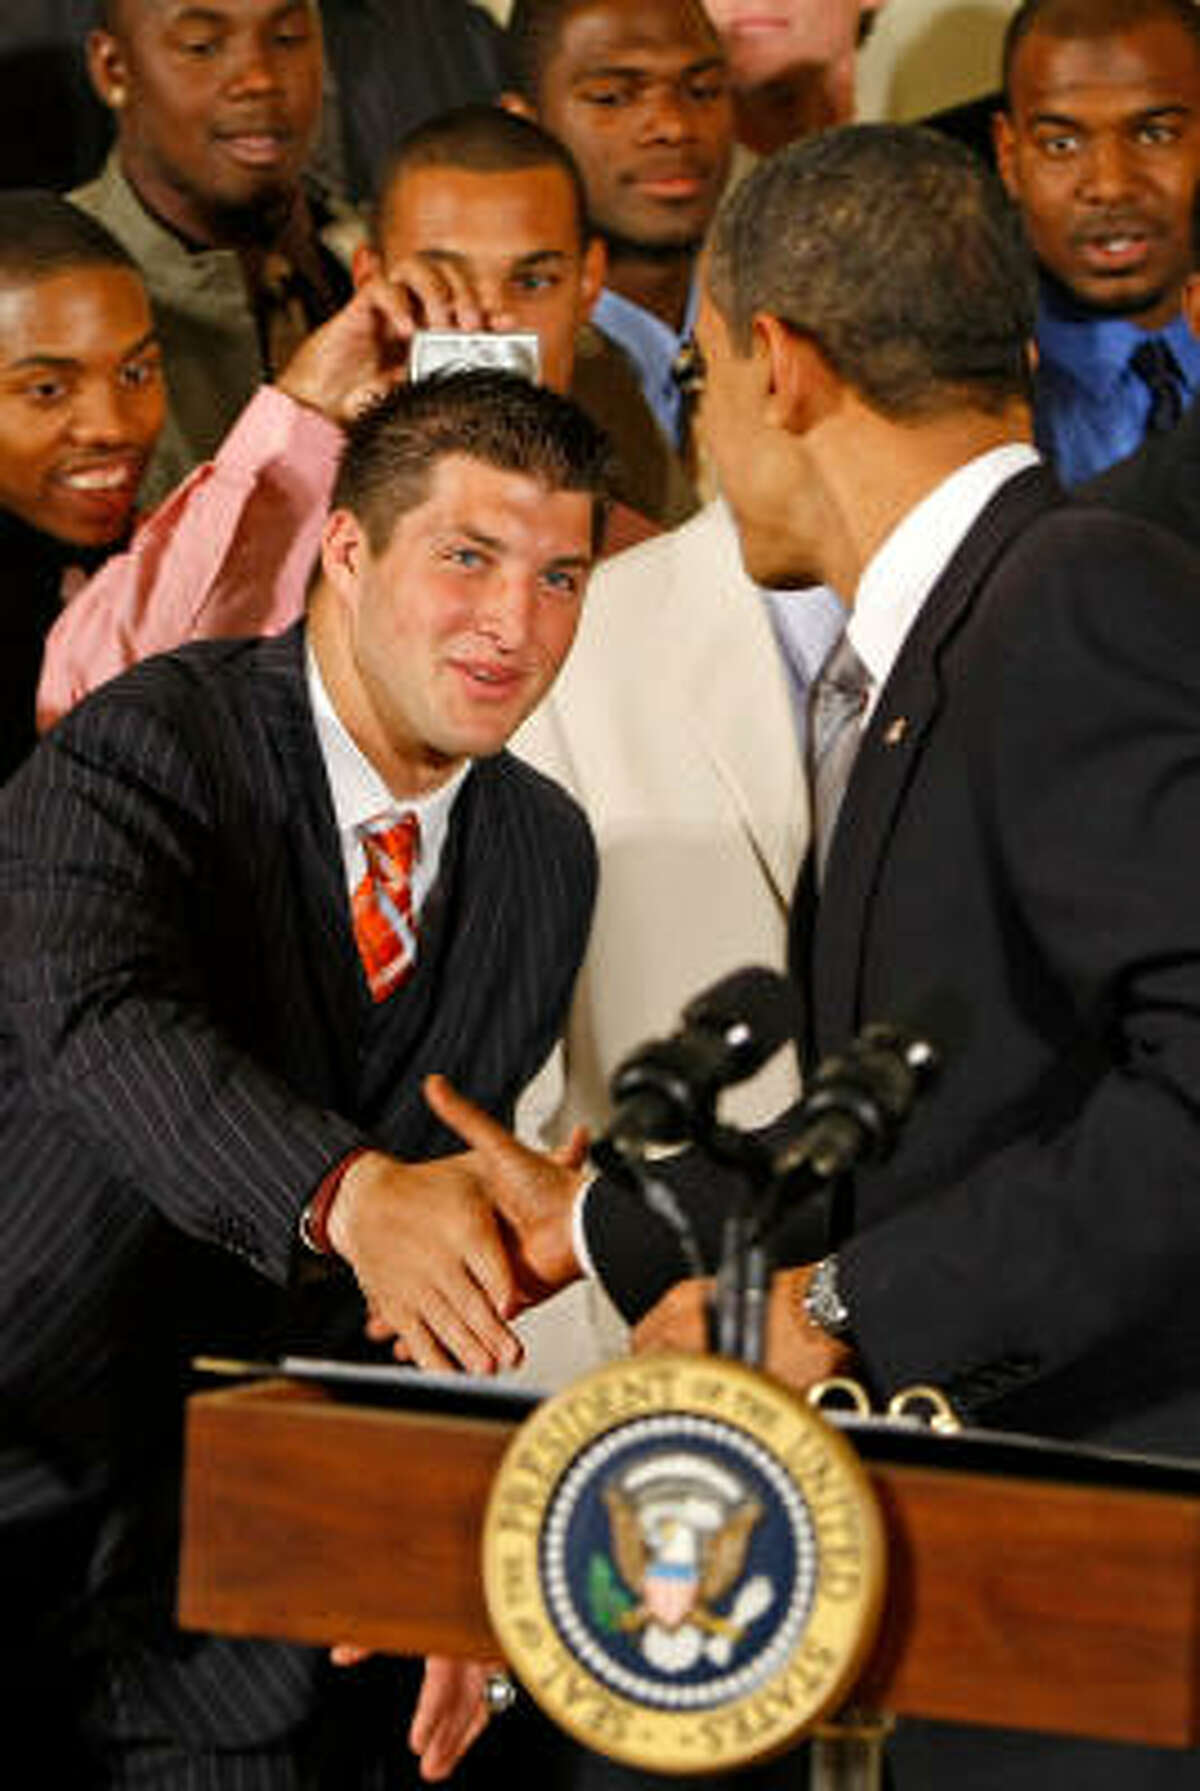 President Obama shakes hands with Florida's star quarterback, Tim Tebow.